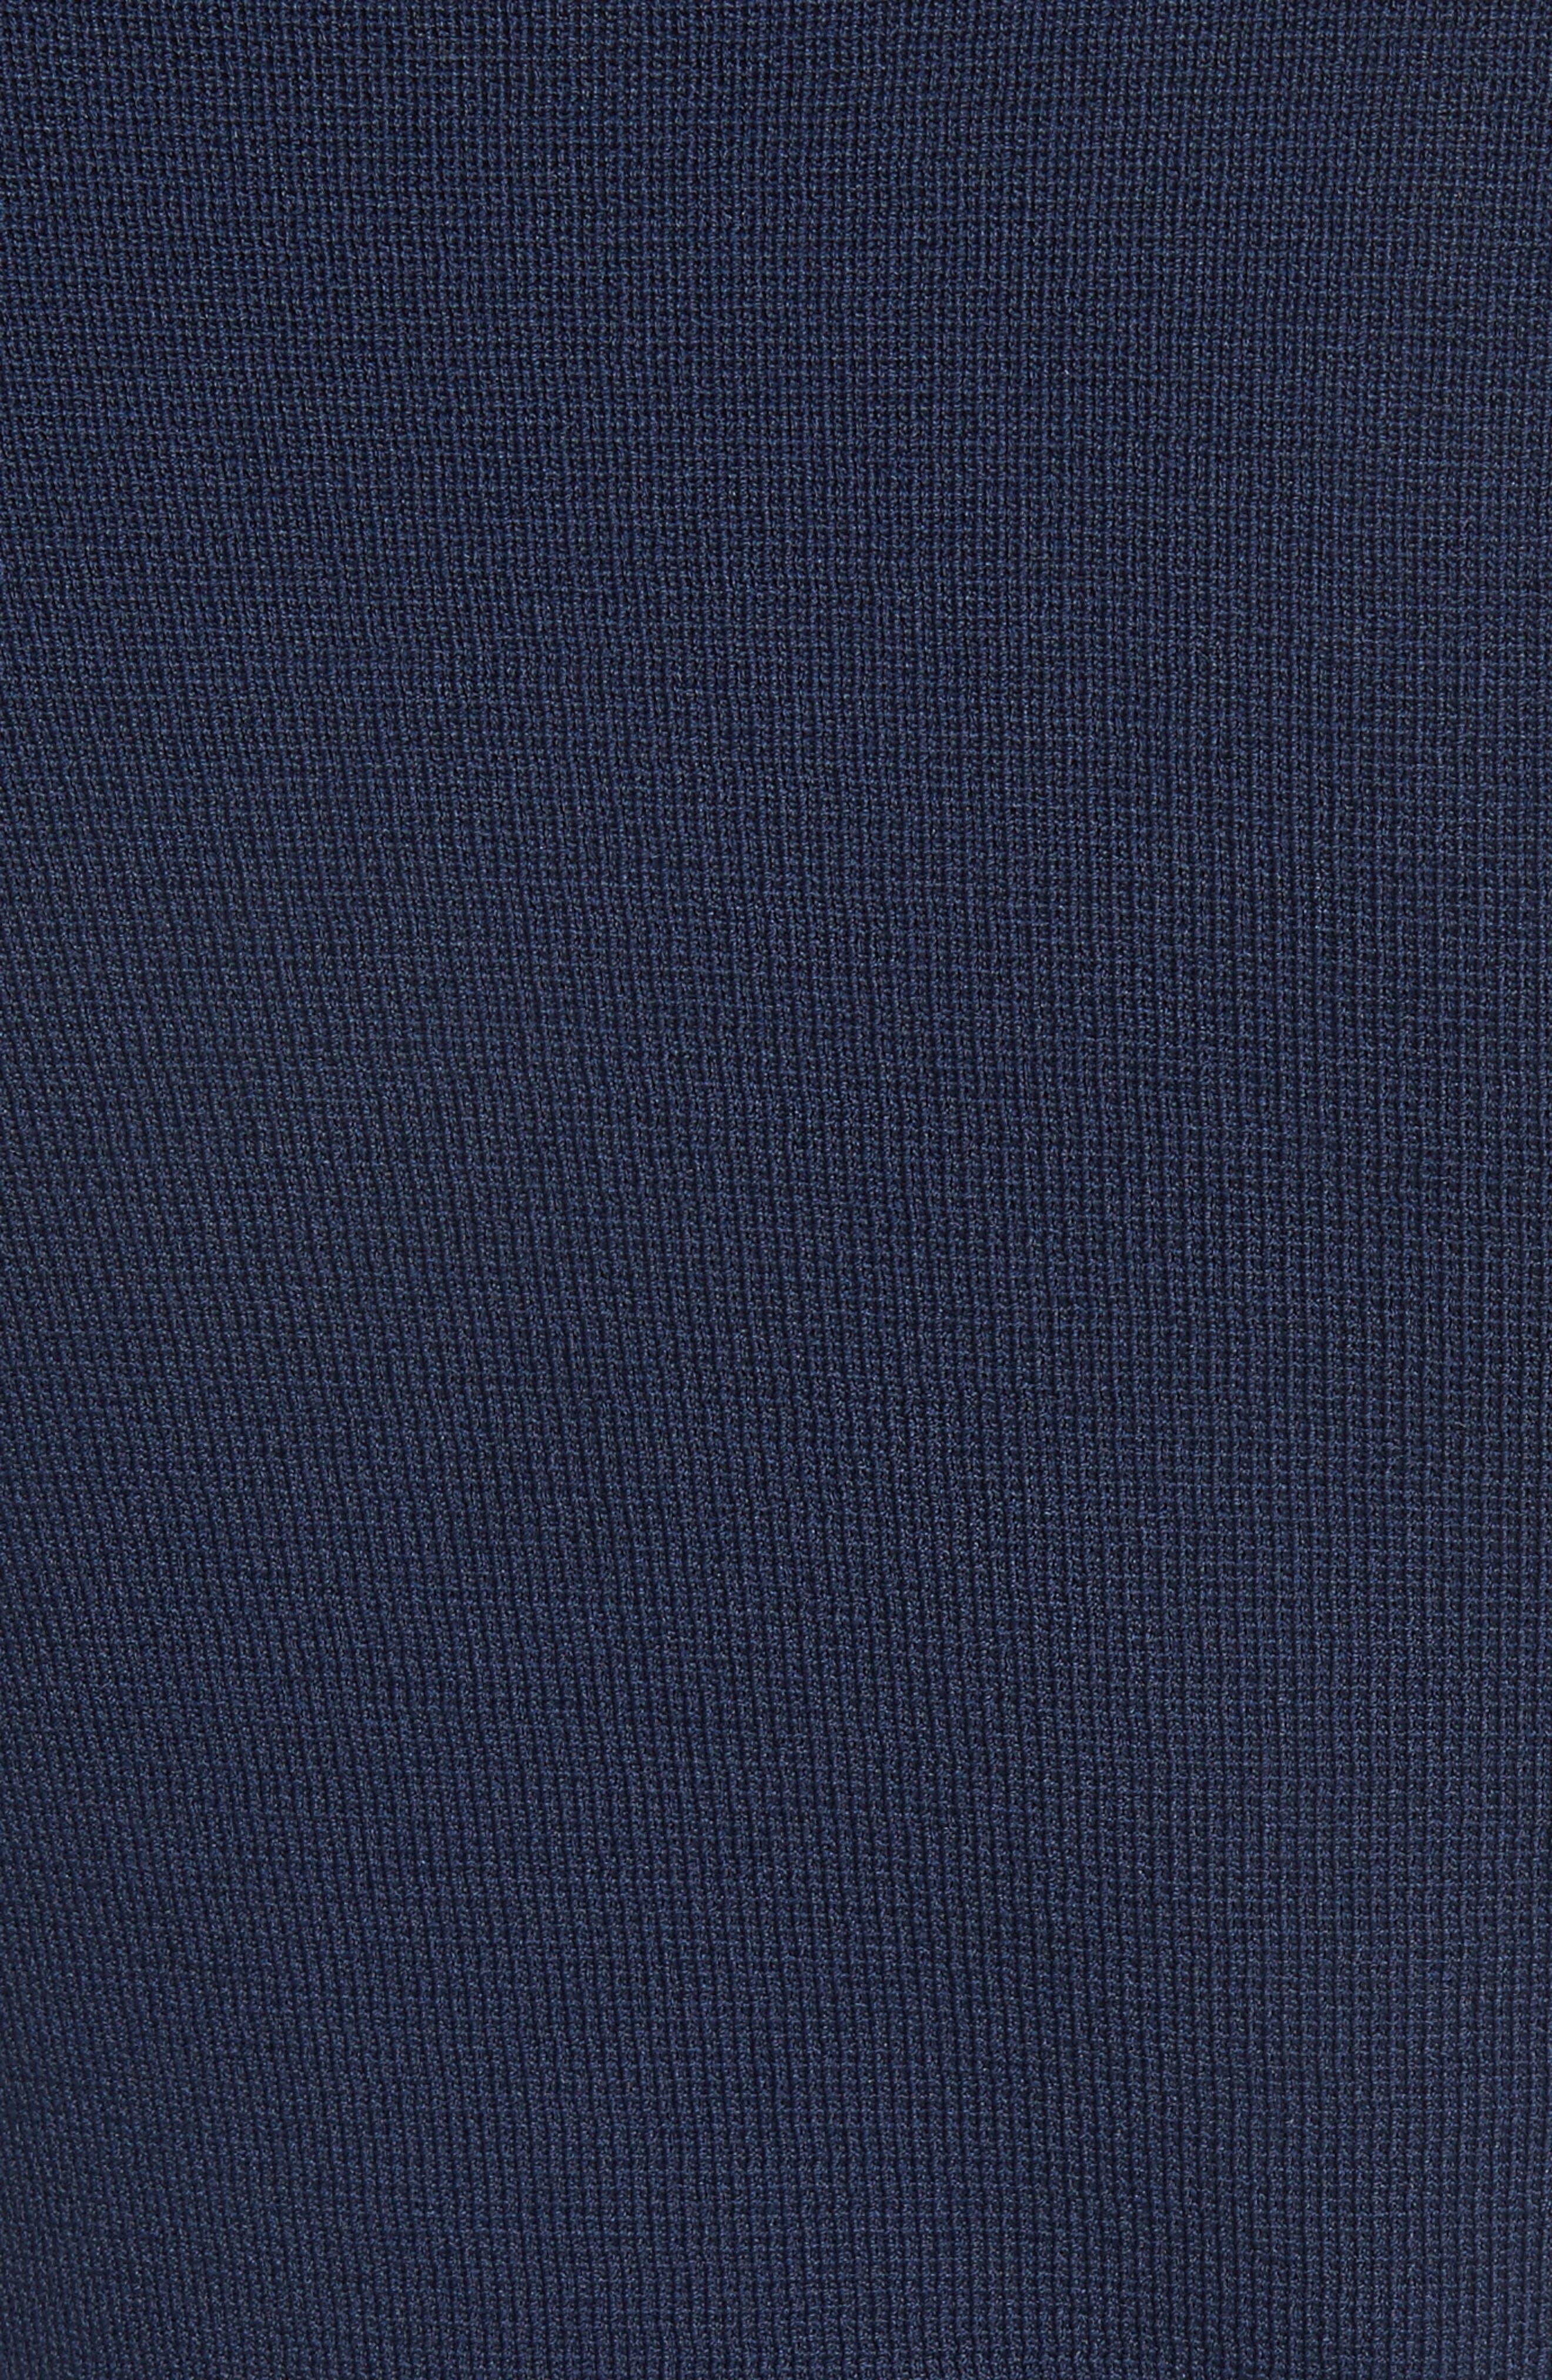 Button Detail Knit Dress,                             Alternate thumbnail 6, color,                             Navy